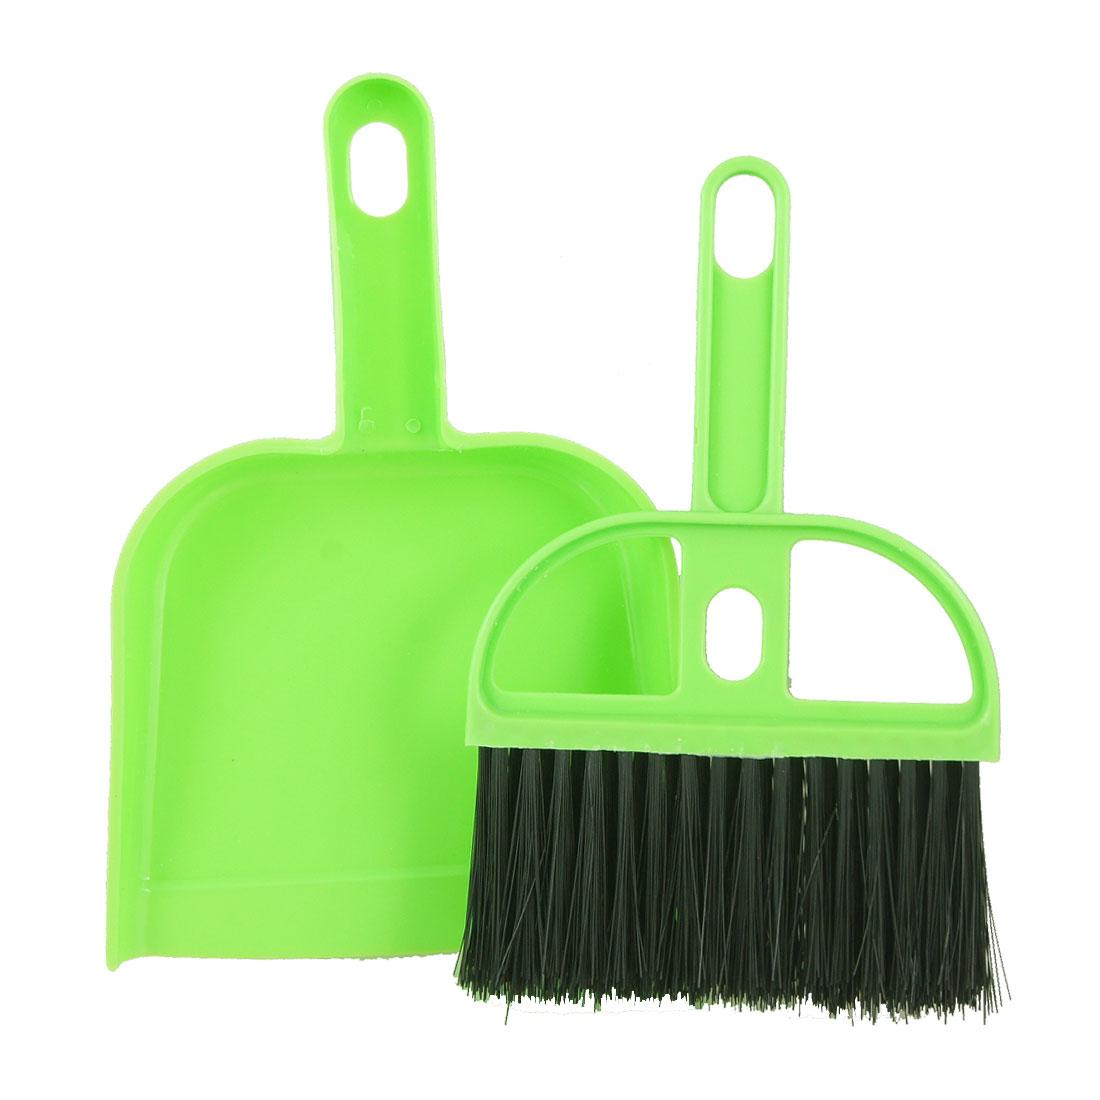 Mini Green Black Car Keyboard Cleaning Whisk Broom Dustpan Set